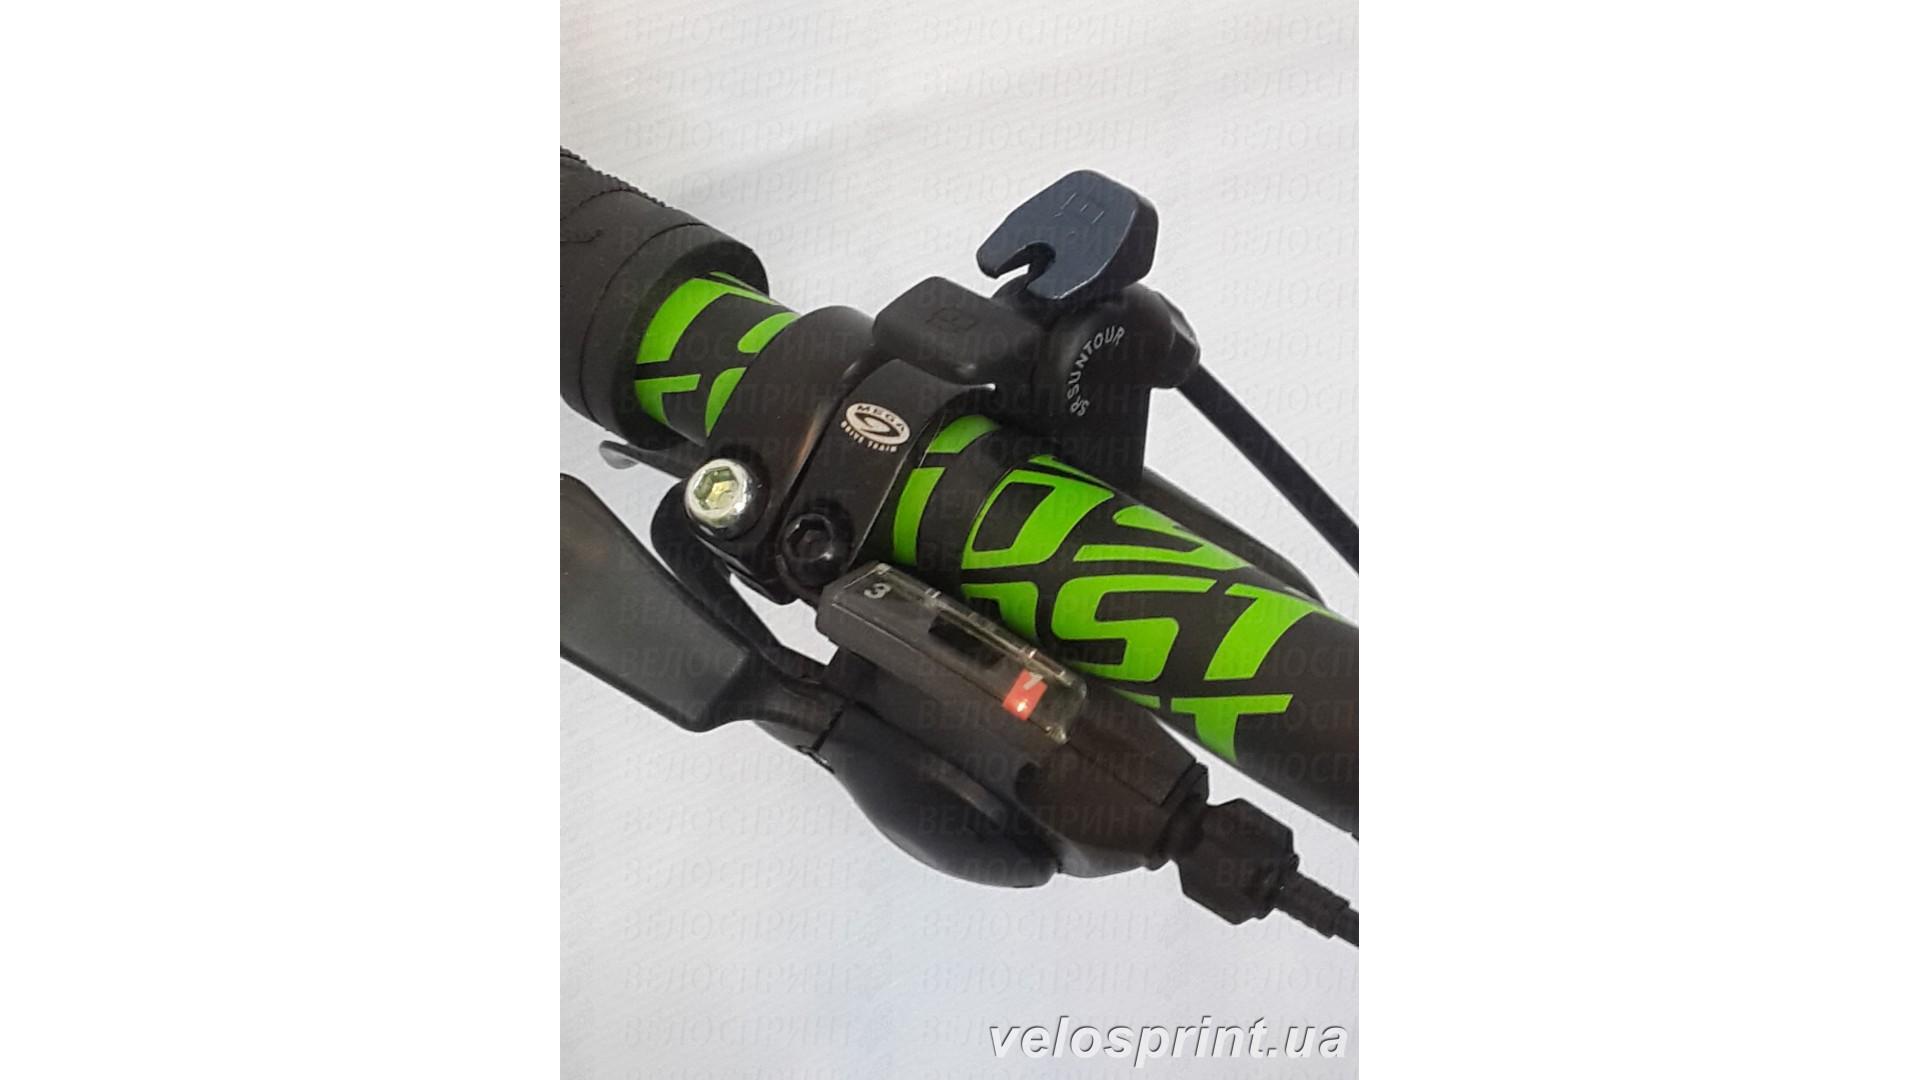 Велосипед GHOST Kato 3 green/darkgreen/black блокировка вилки вид2 год 2016